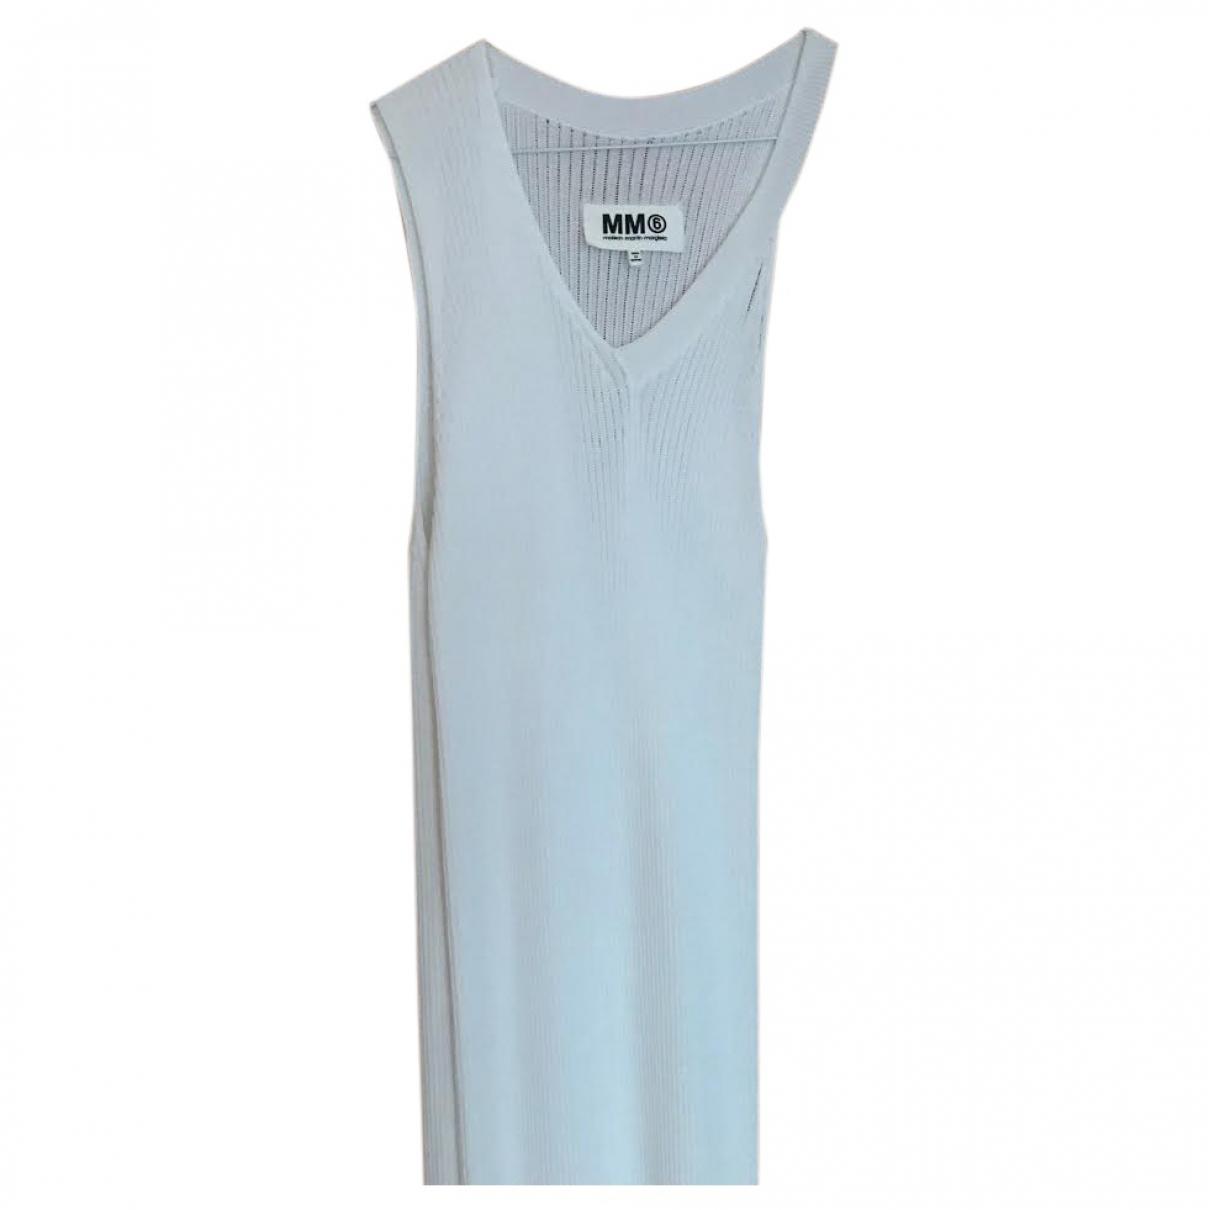 Mm6 \N Kleid in  Weiss Polyester